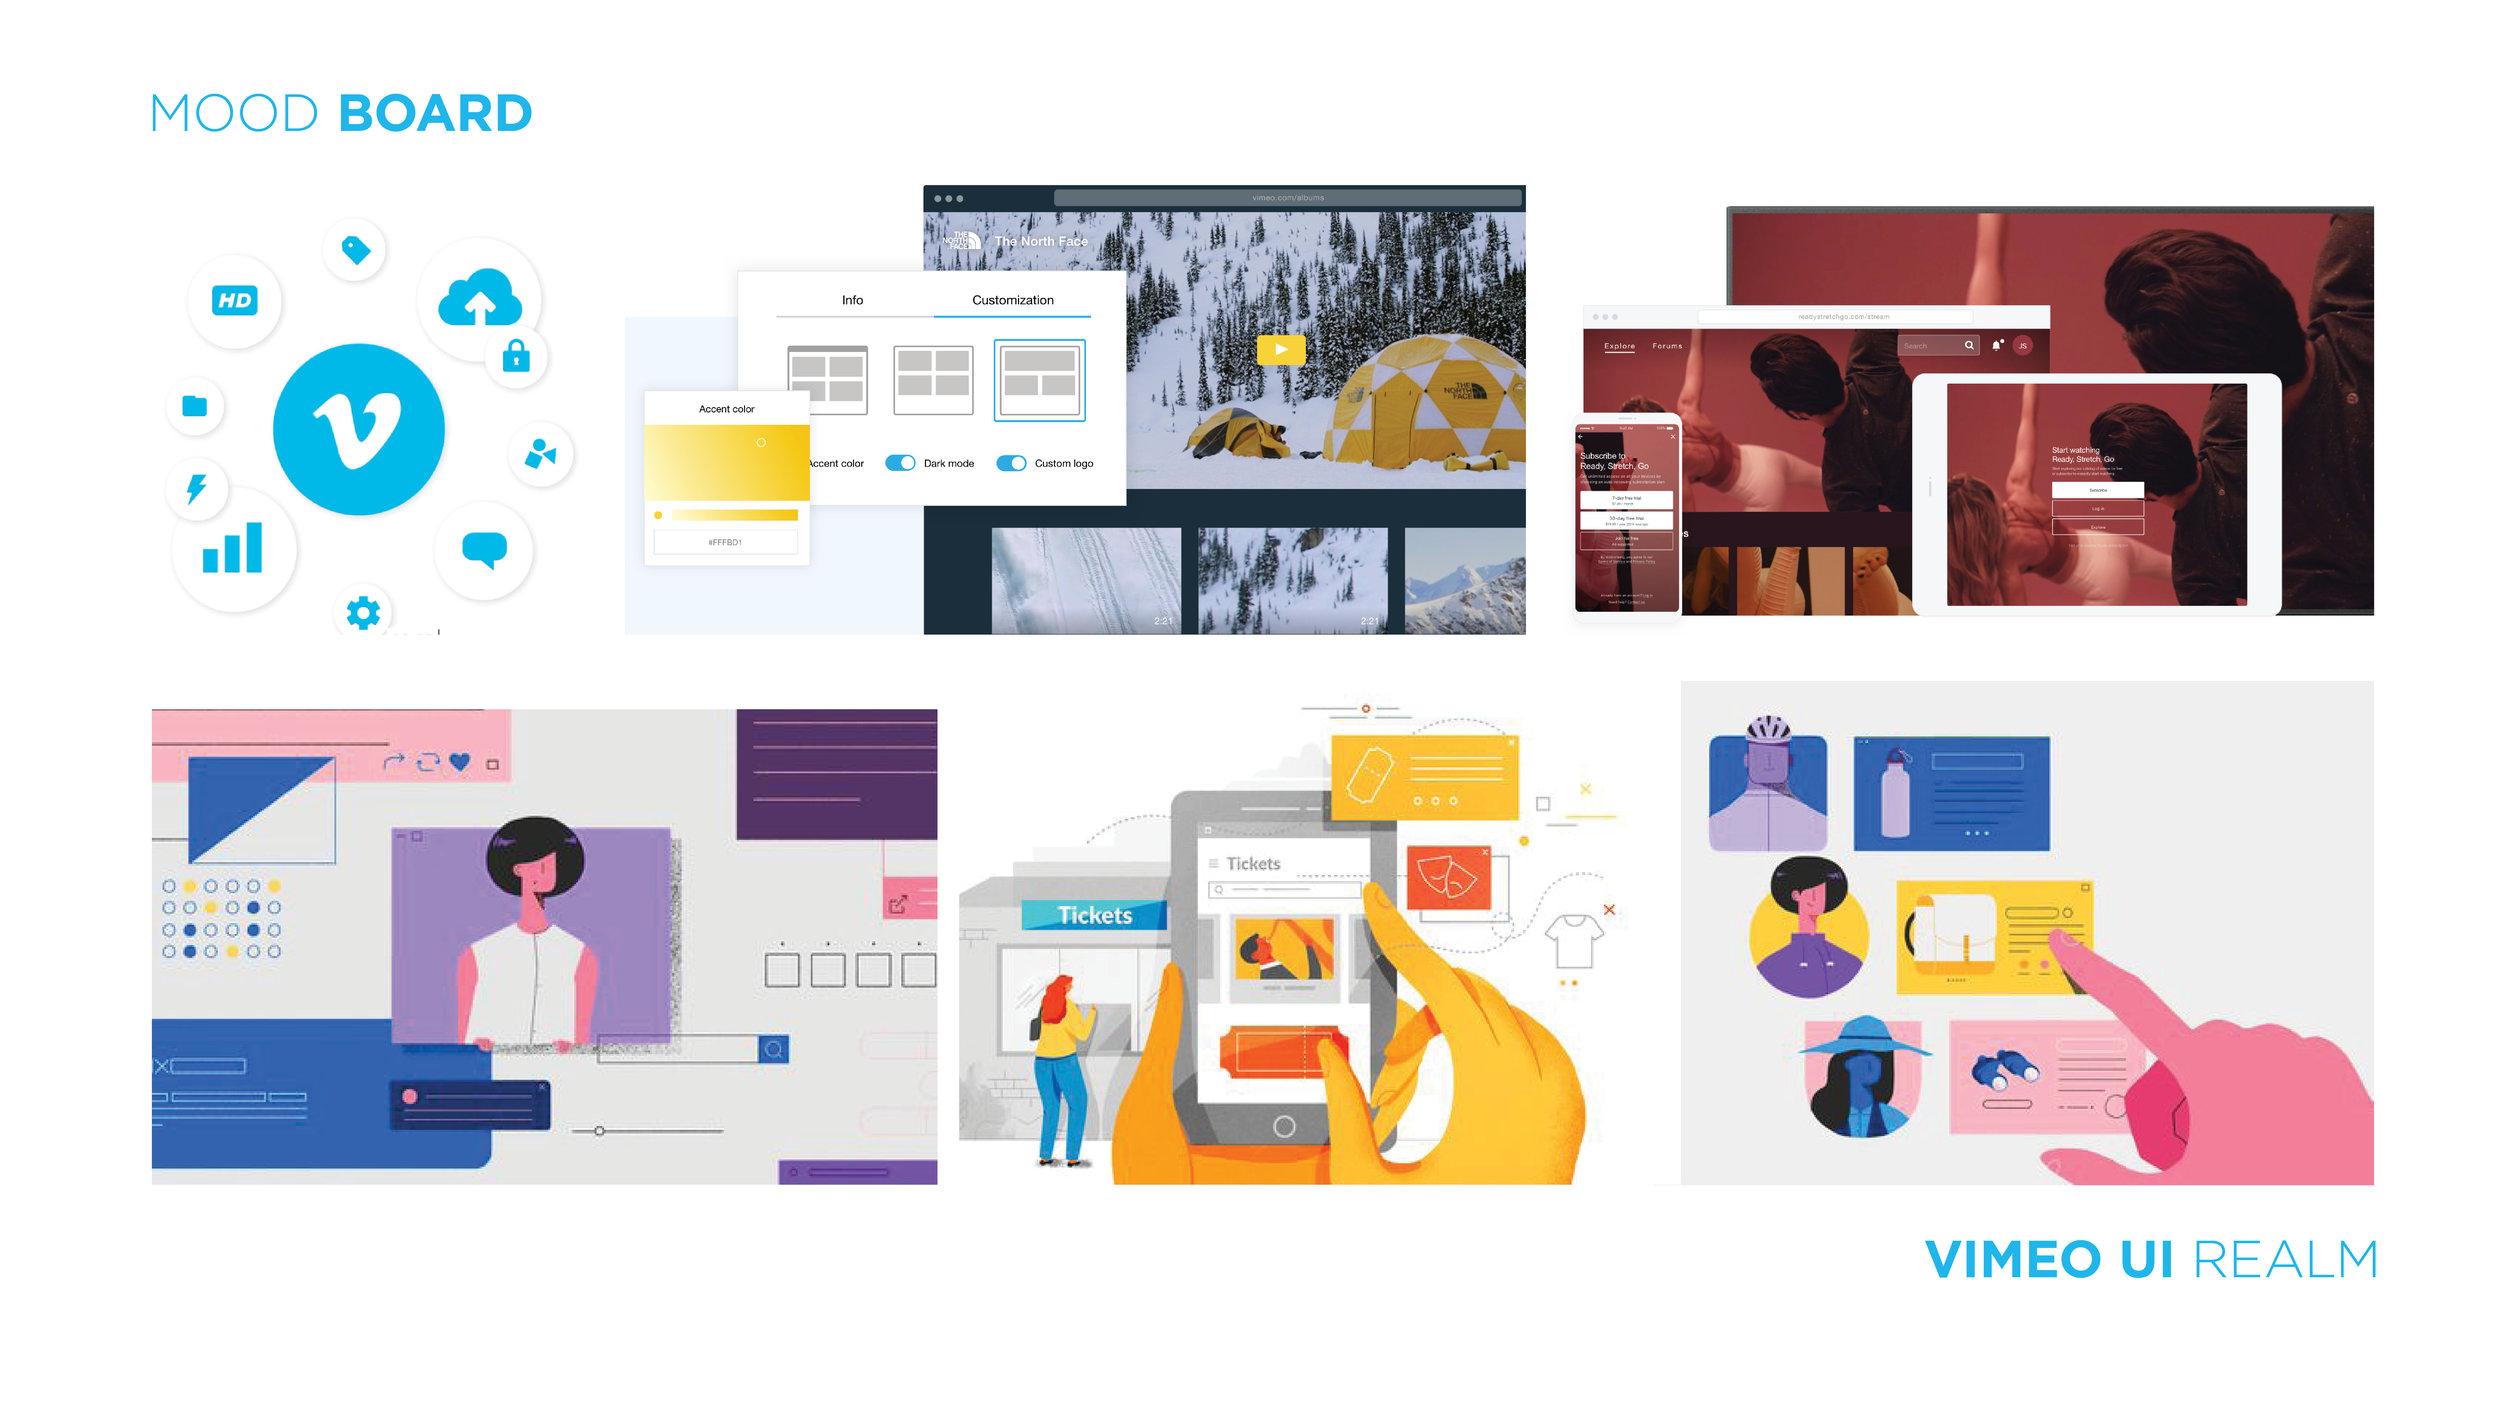 vimeo_processbook copy6.jpg